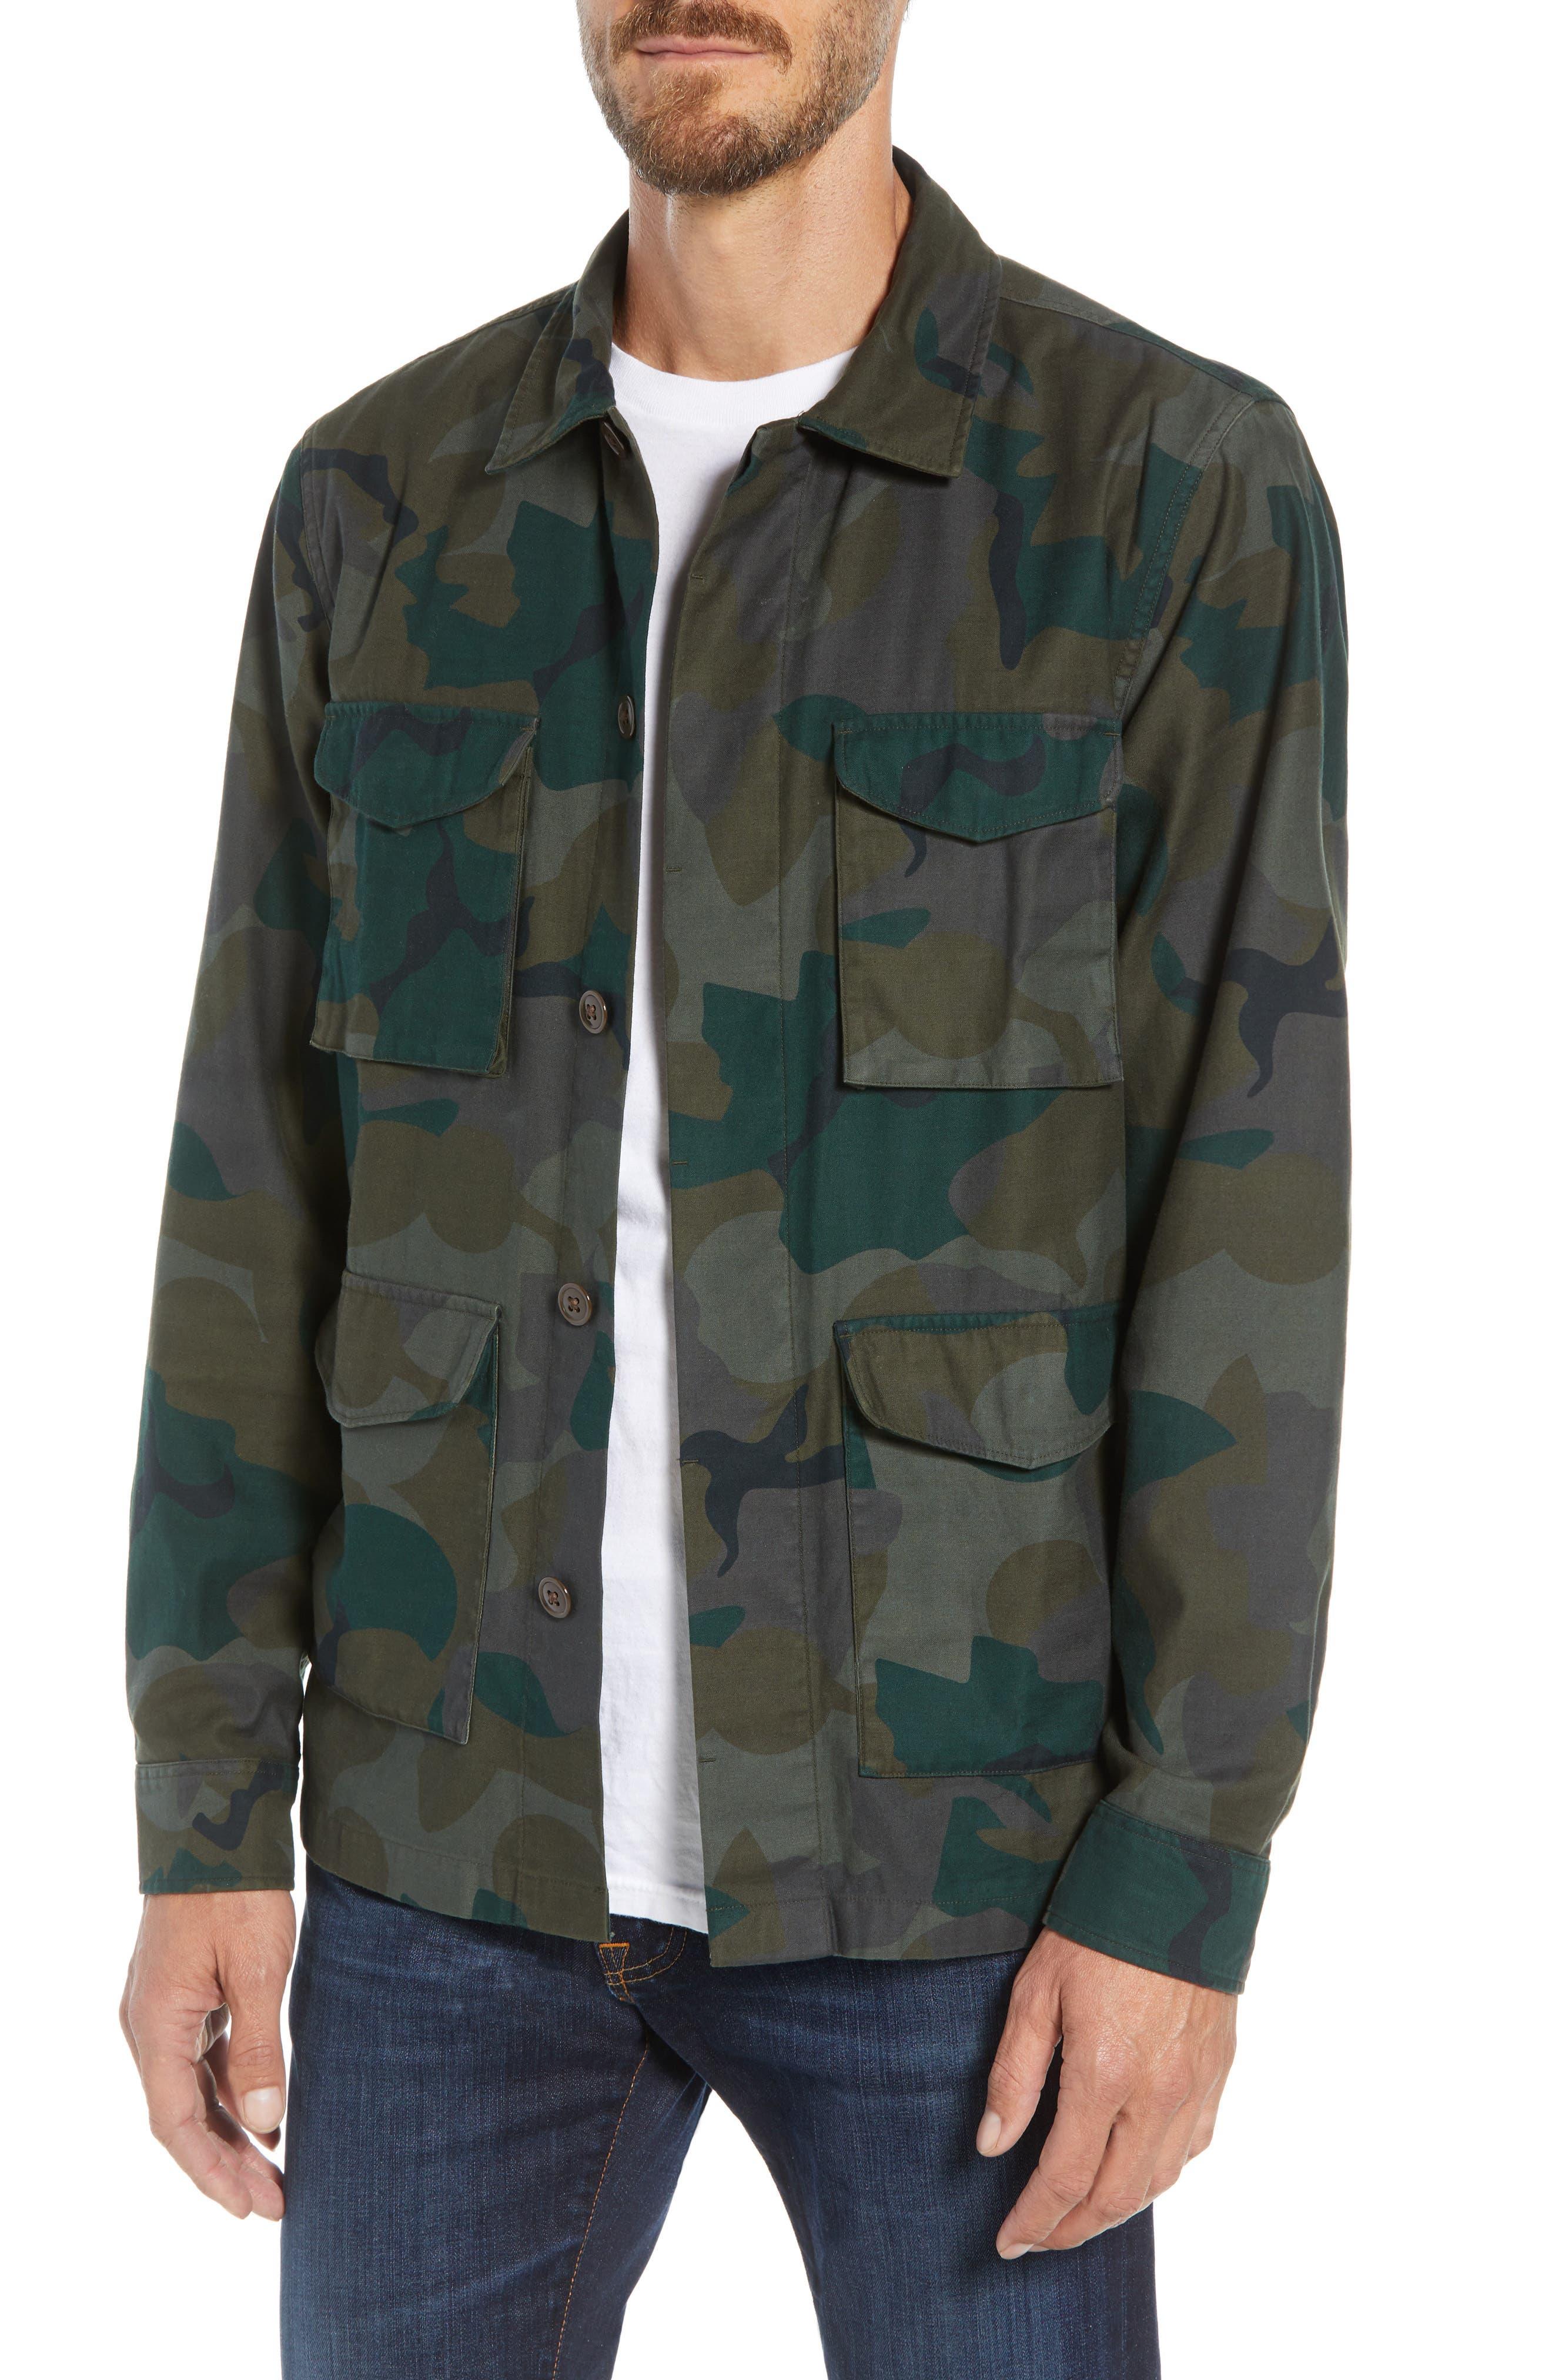 Four-Pocket Military Jacket,                             Main thumbnail 1, color,                             301